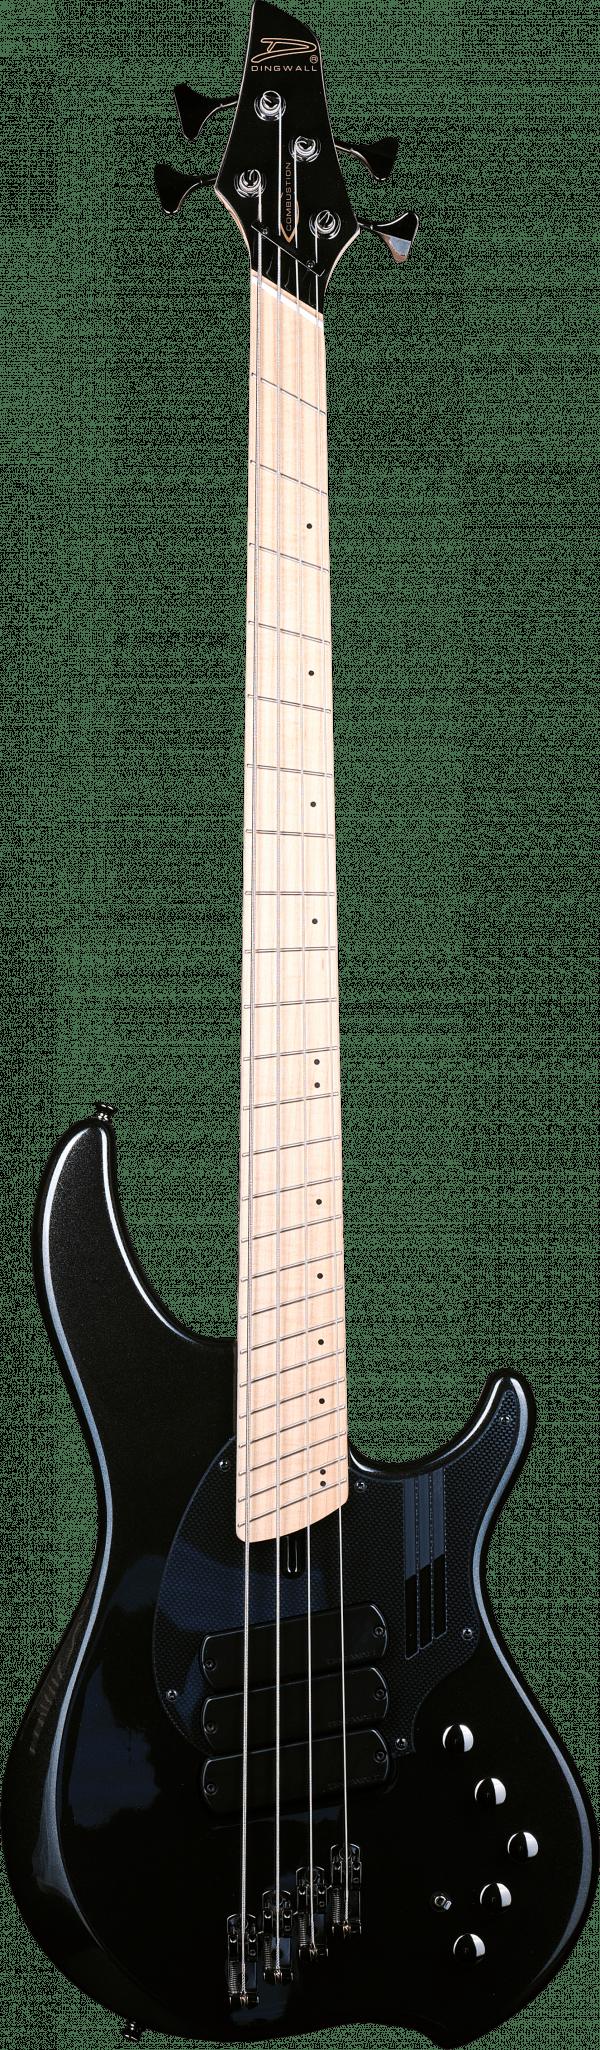 Dingwall NG3-4 Metallic Black